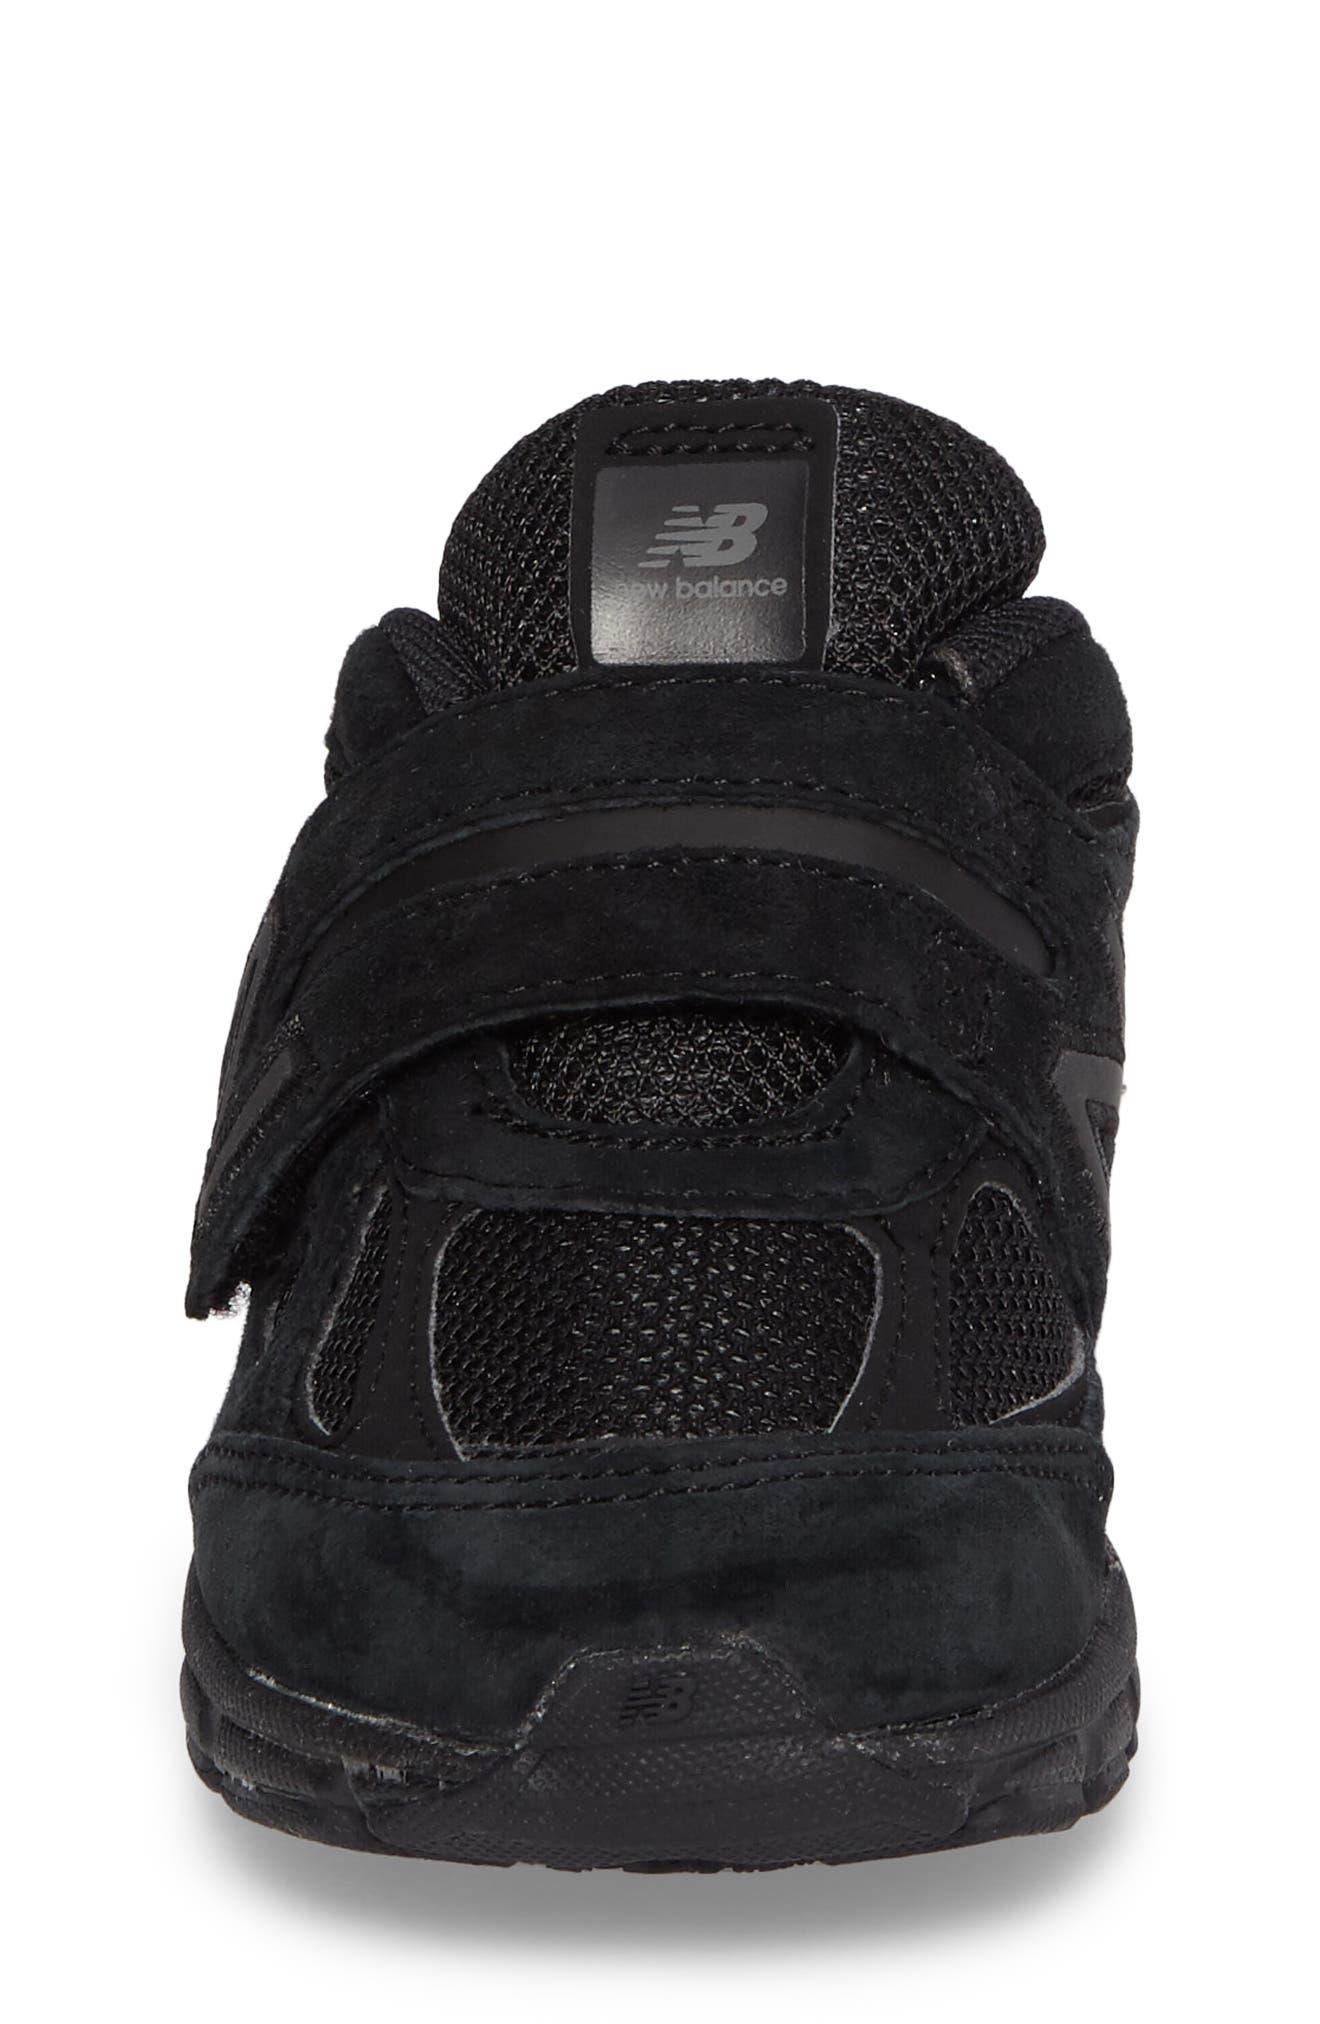 '990v4' Sneaker,                             Alternate thumbnail 4, color,                             Black/ Black